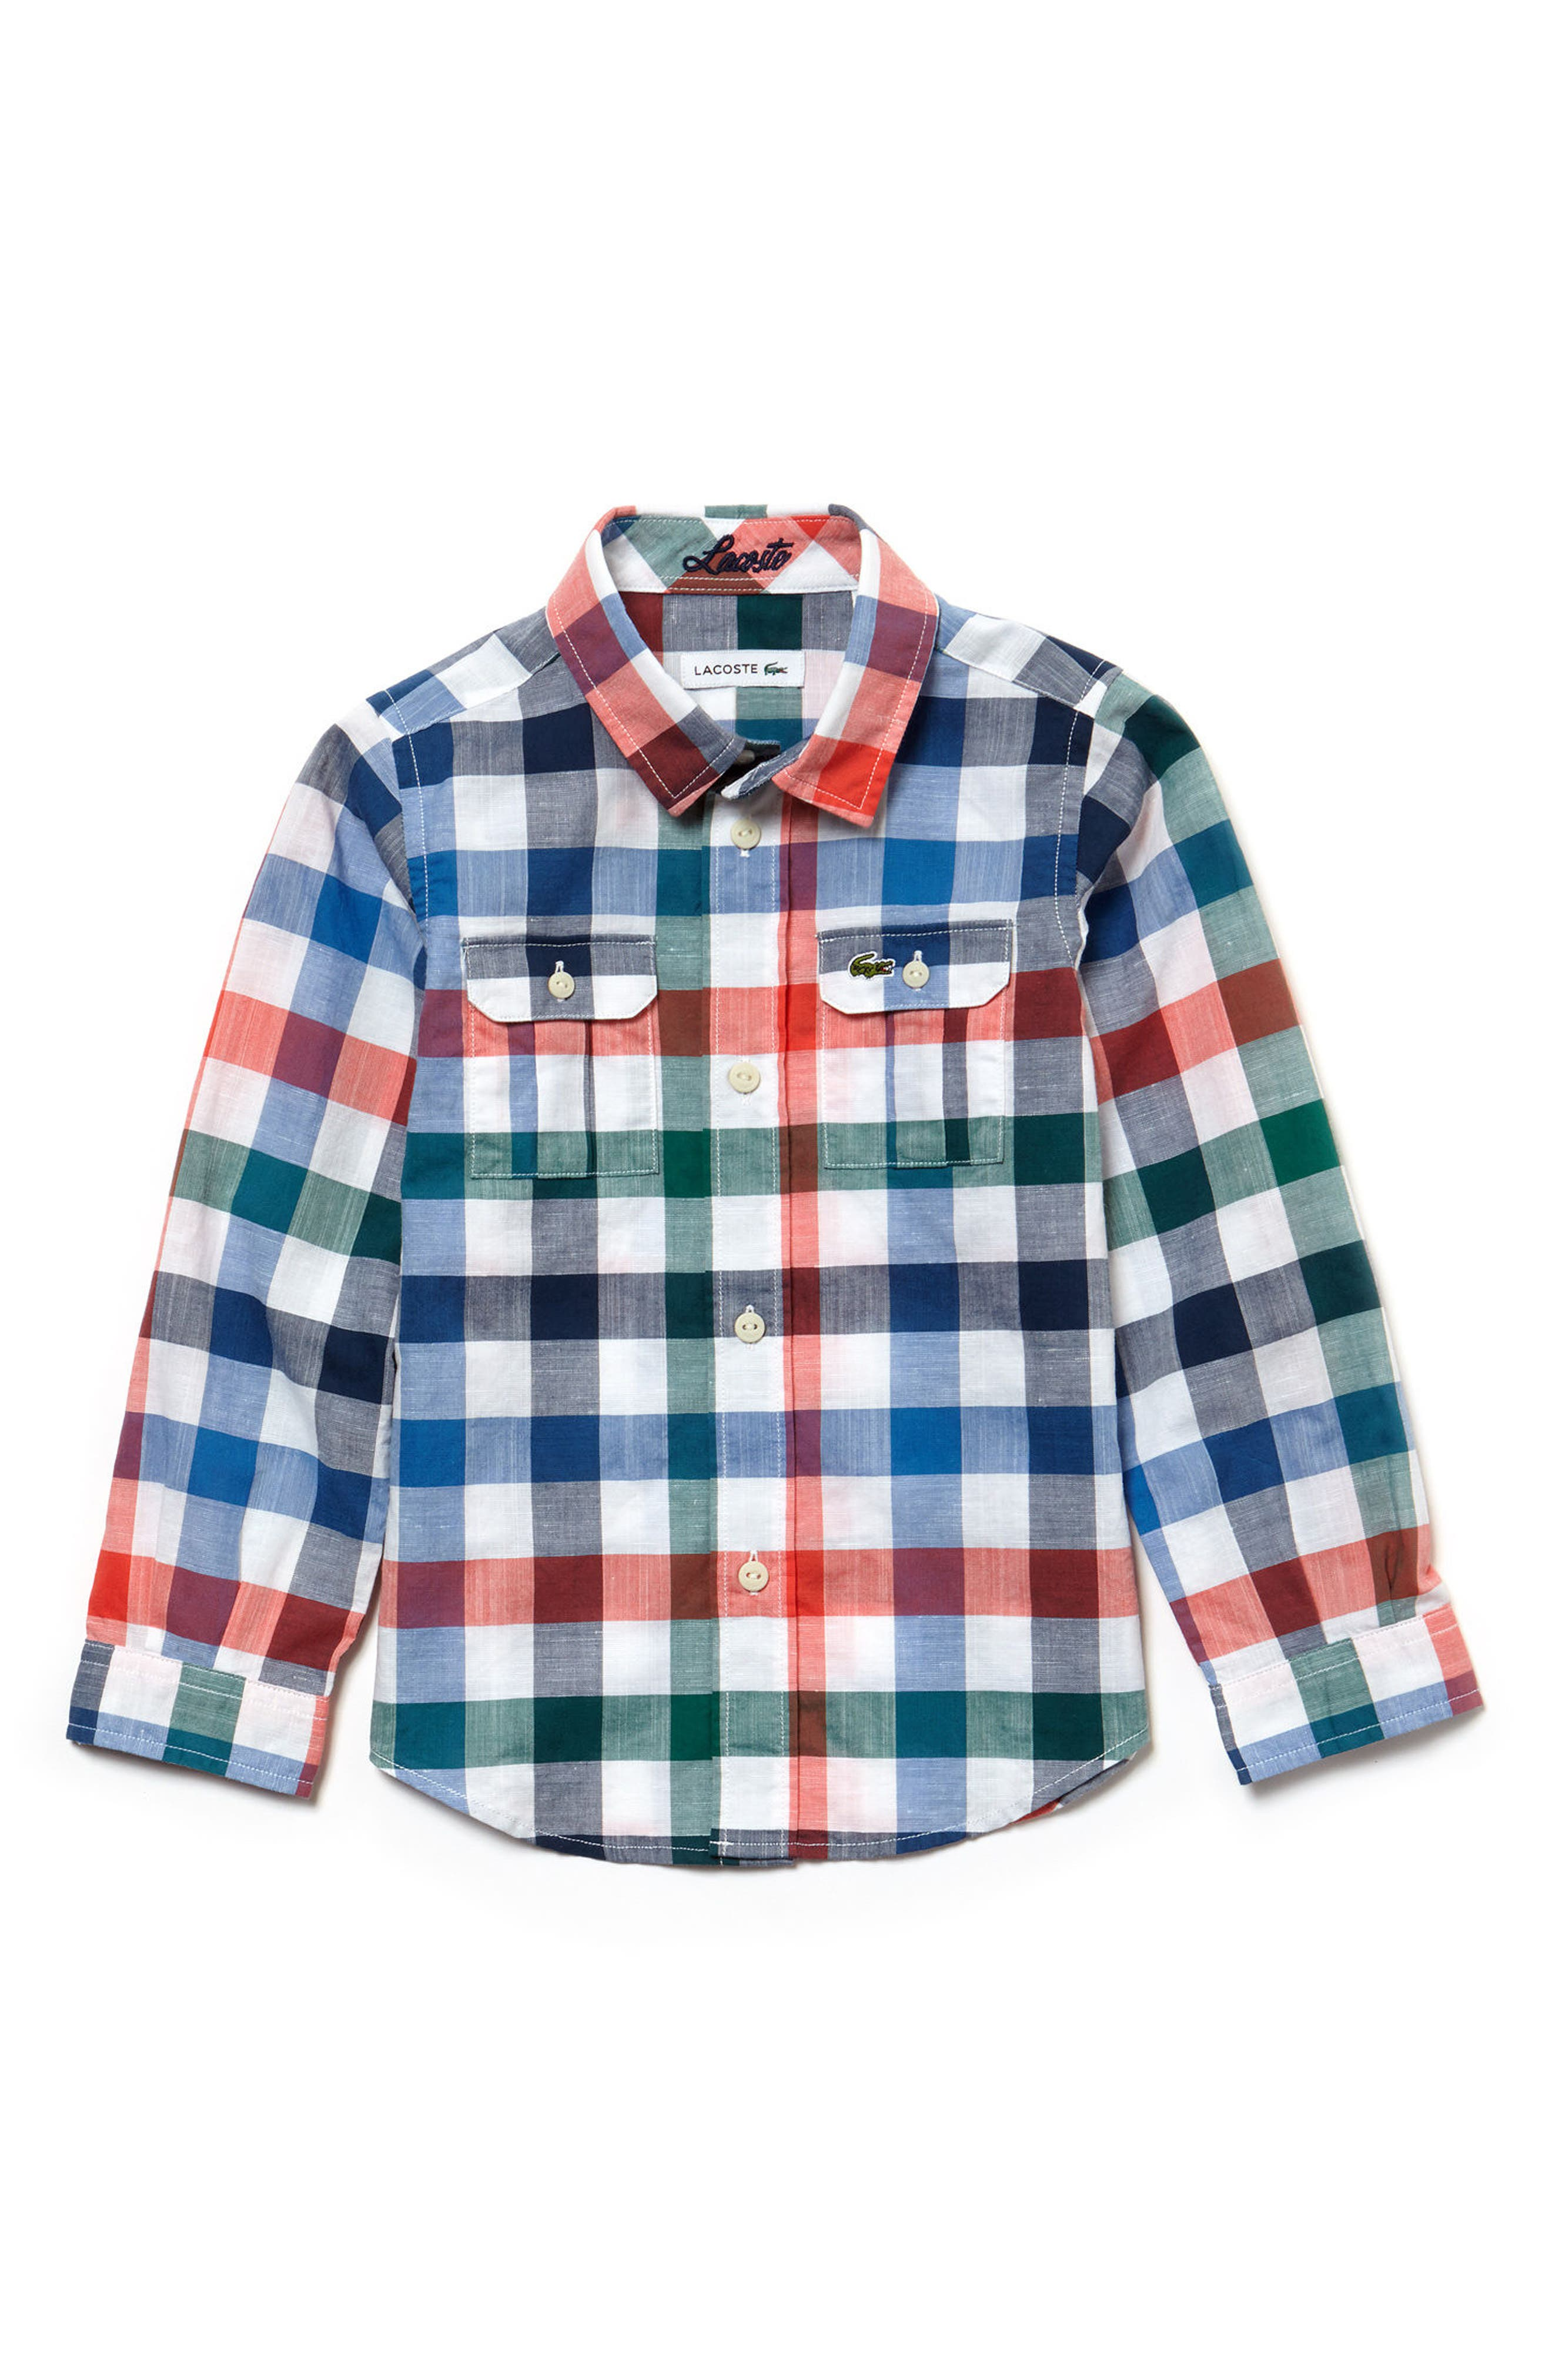 Lacoste Check Woven Shirt (Little Boys)